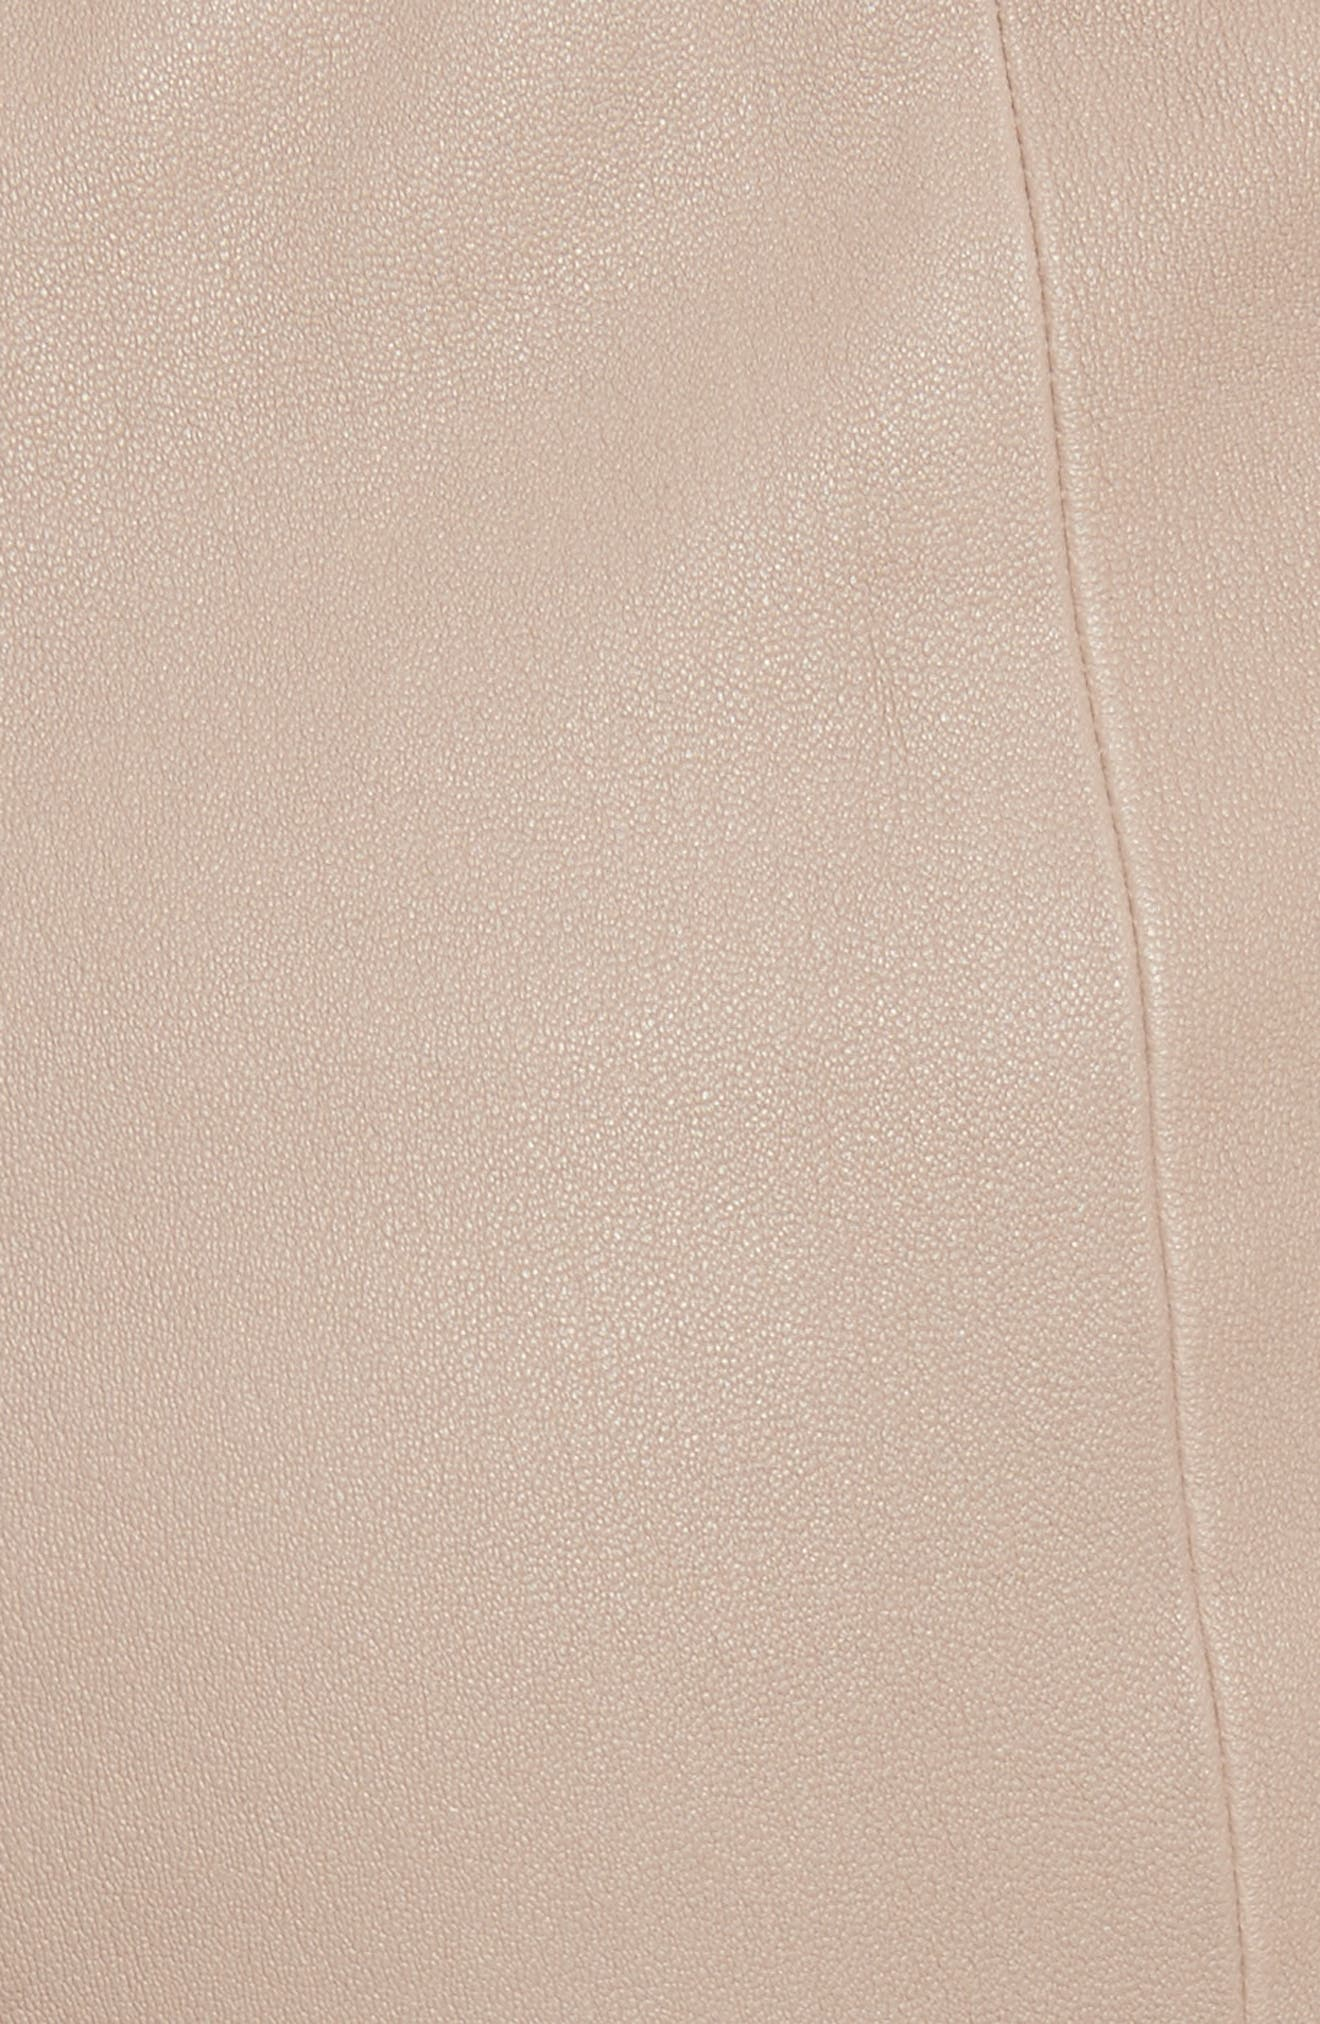 Stretch Leather Pants,                             Alternate thumbnail 5, color,